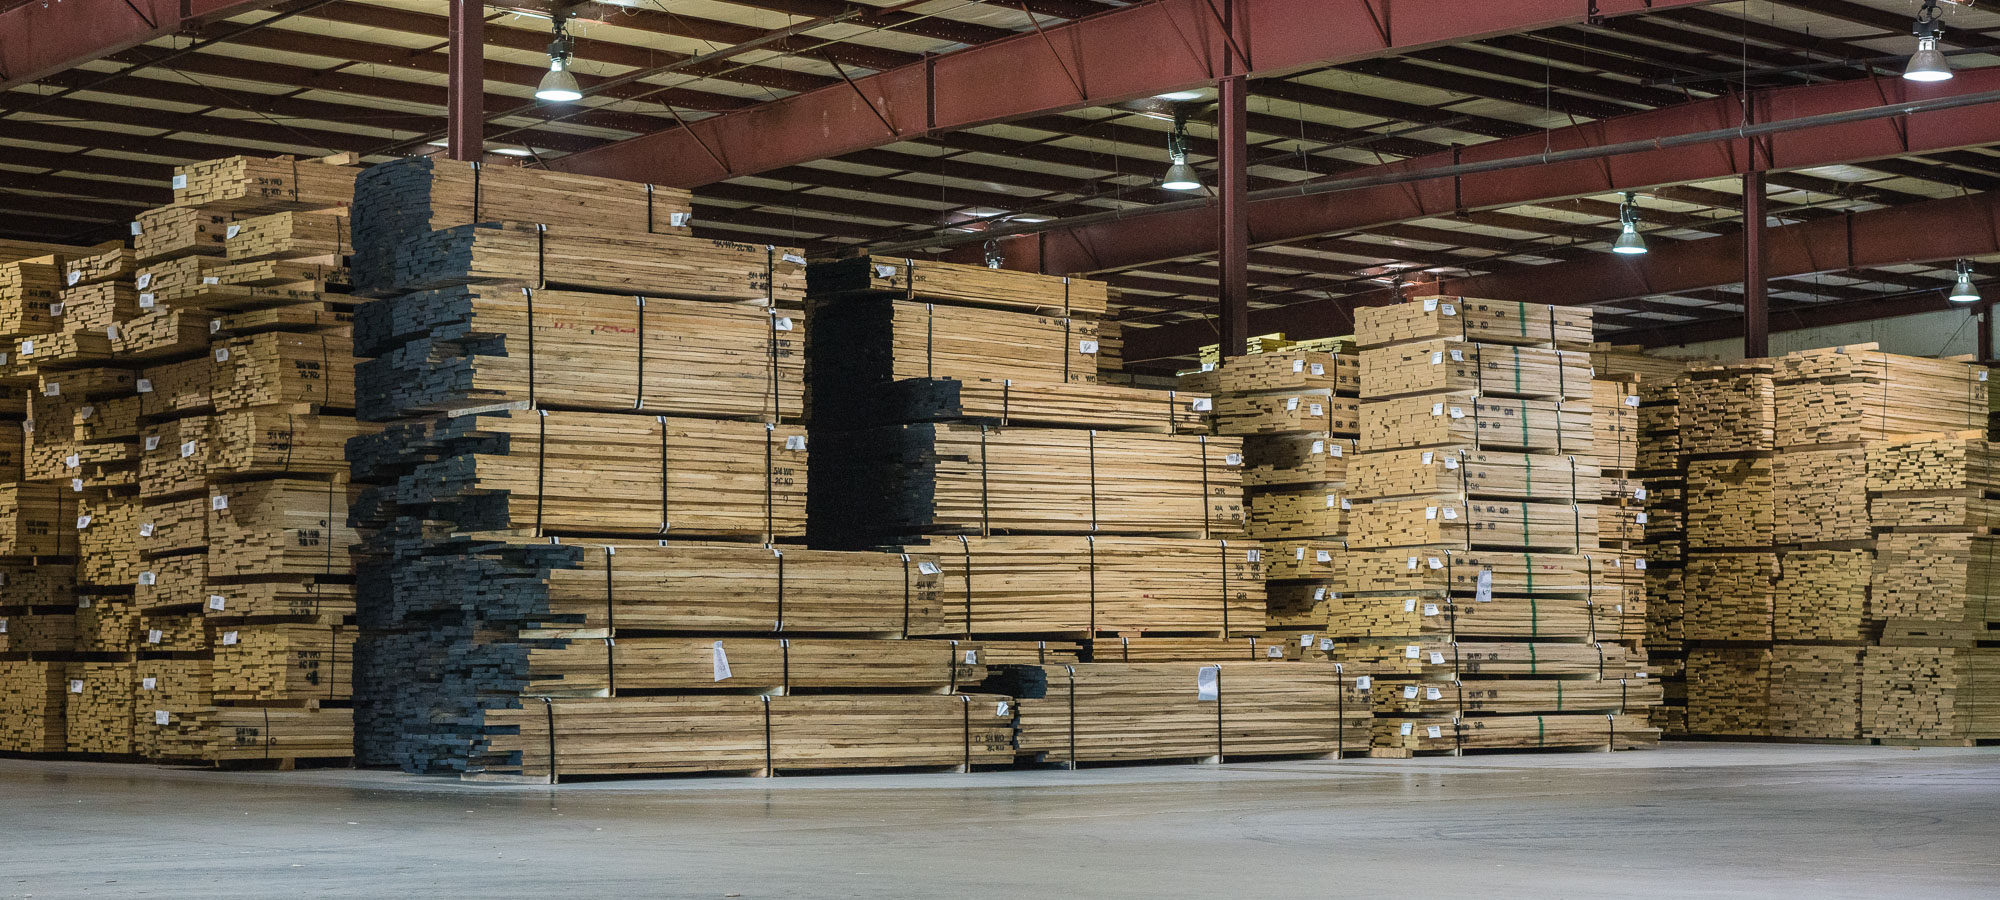 ... Decorating Frank Lumber Door Store Photos : Retail Store And Lumber  Outlet | Frank Miller Lumber ...